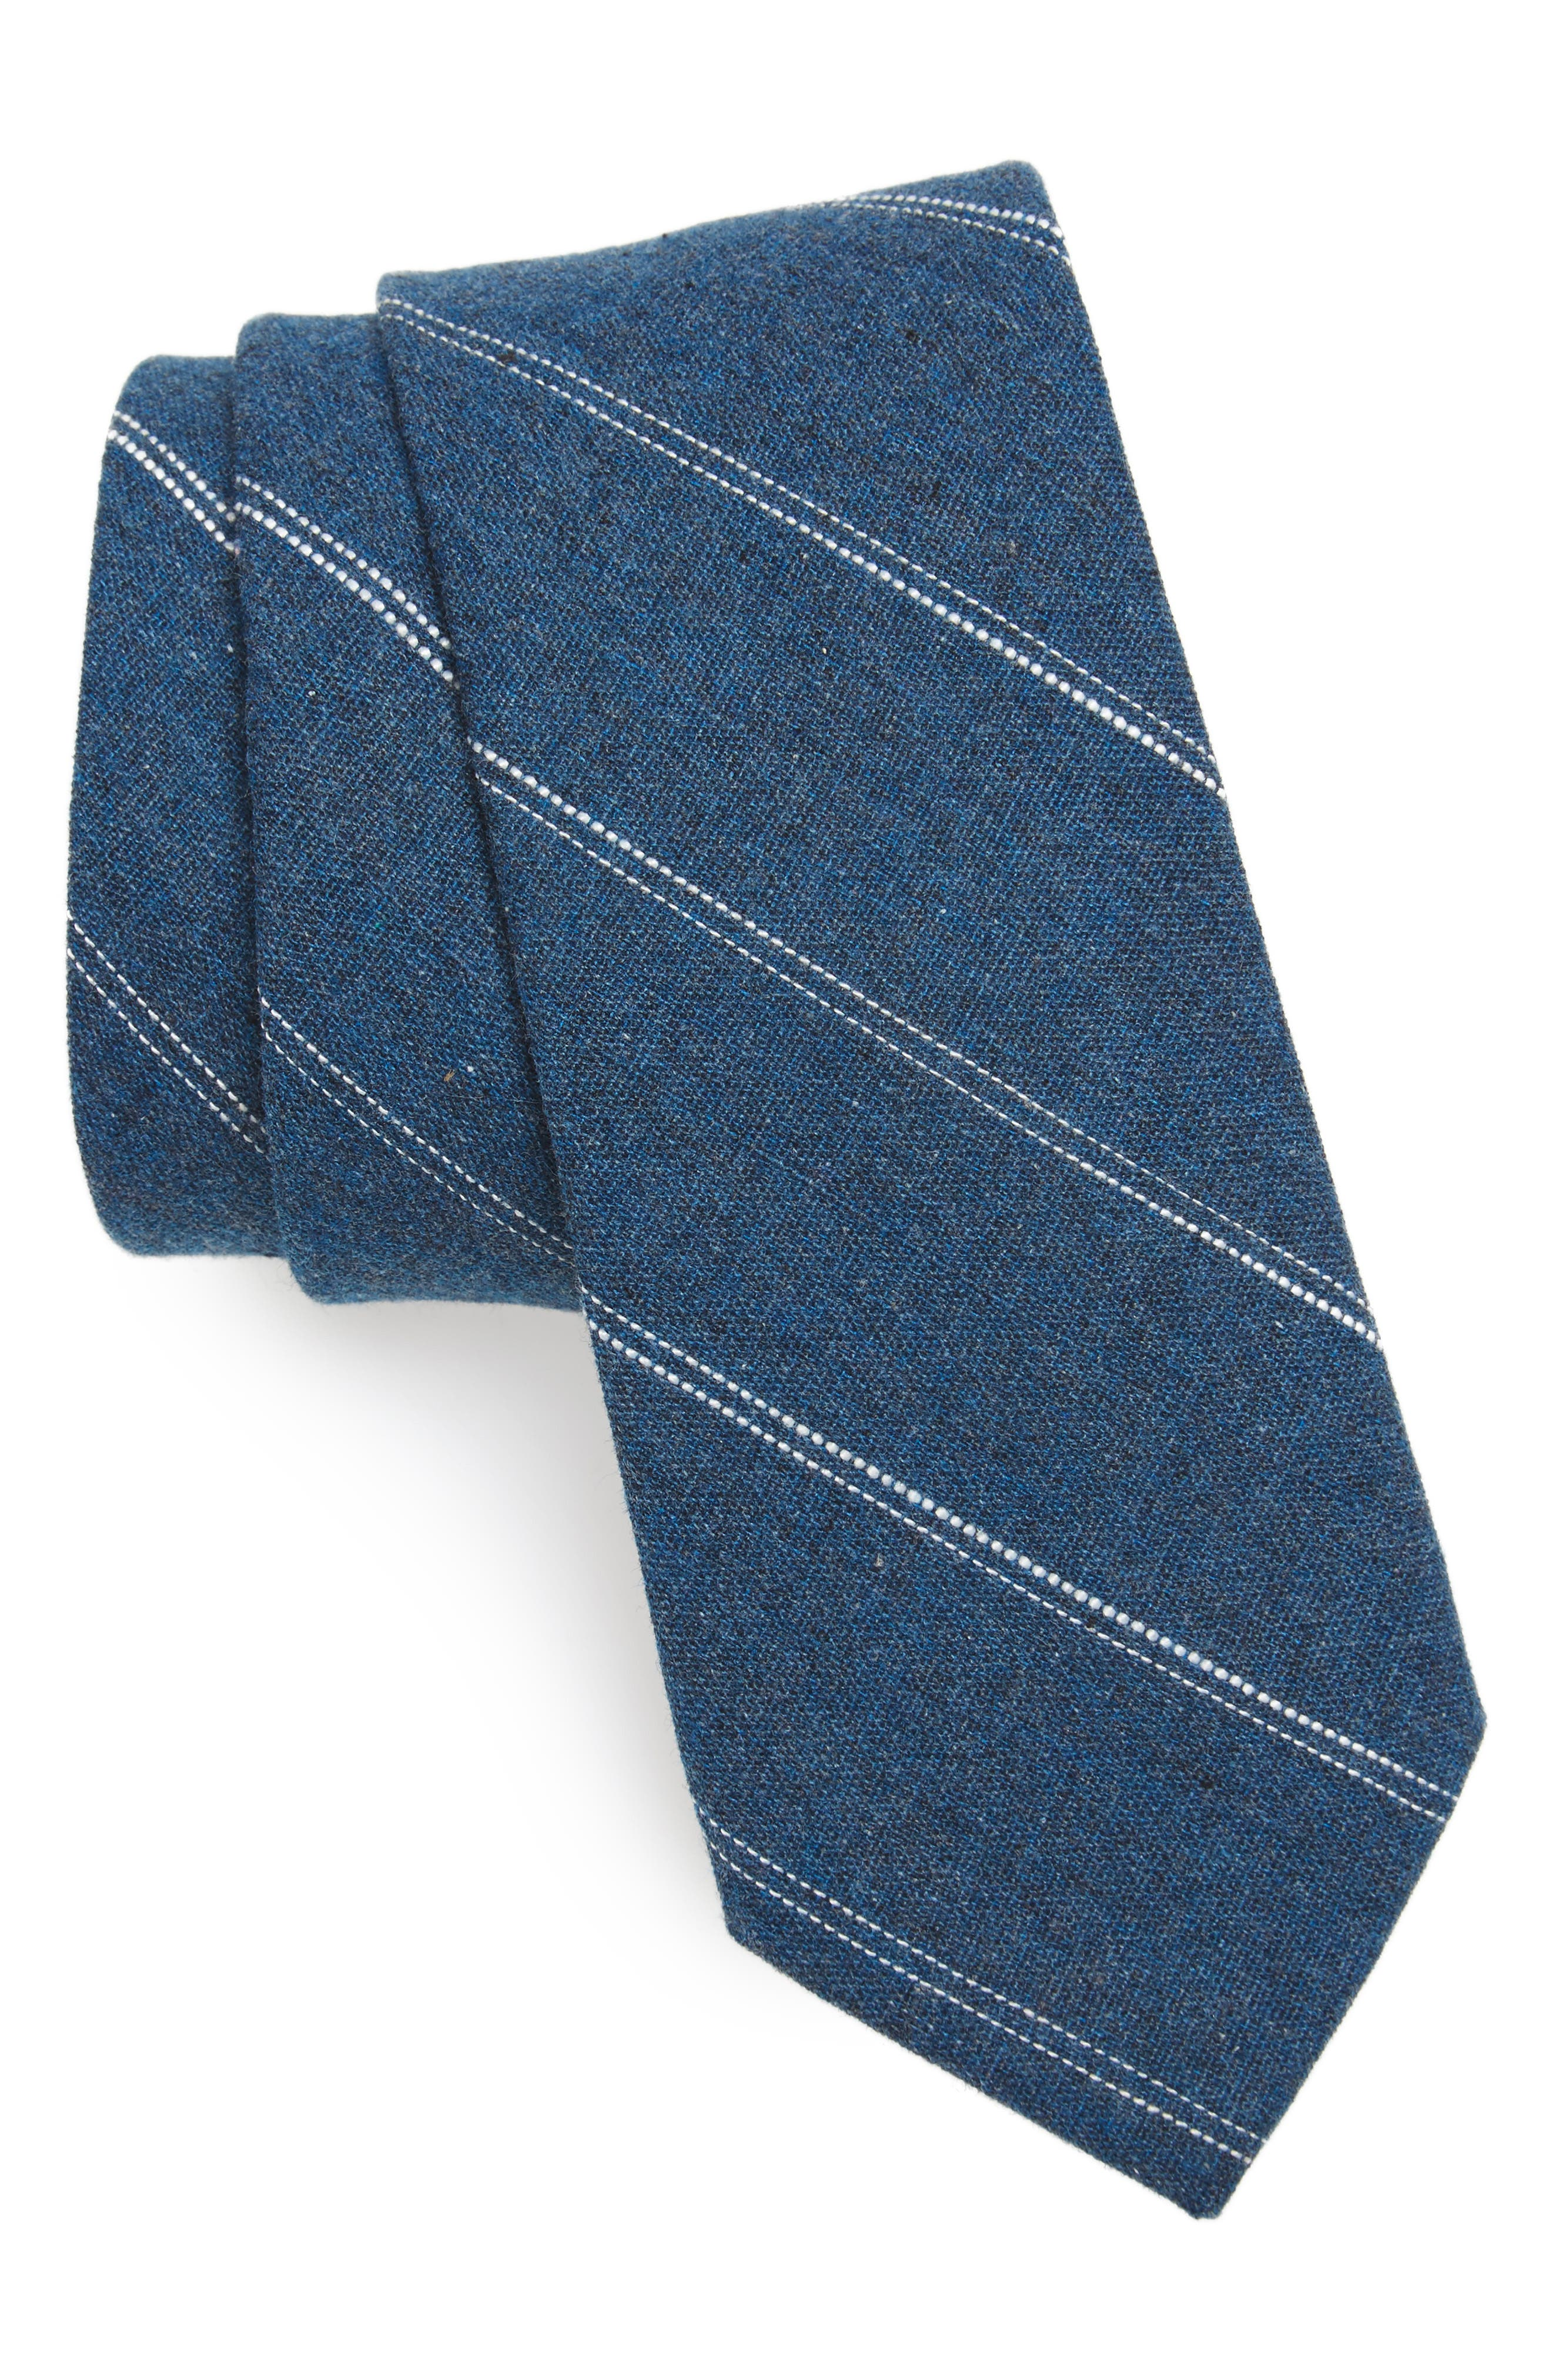 Palamino Stripe Cotton & Linen Skinny Tie,                             Main thumbnail 1, color,                             Teal